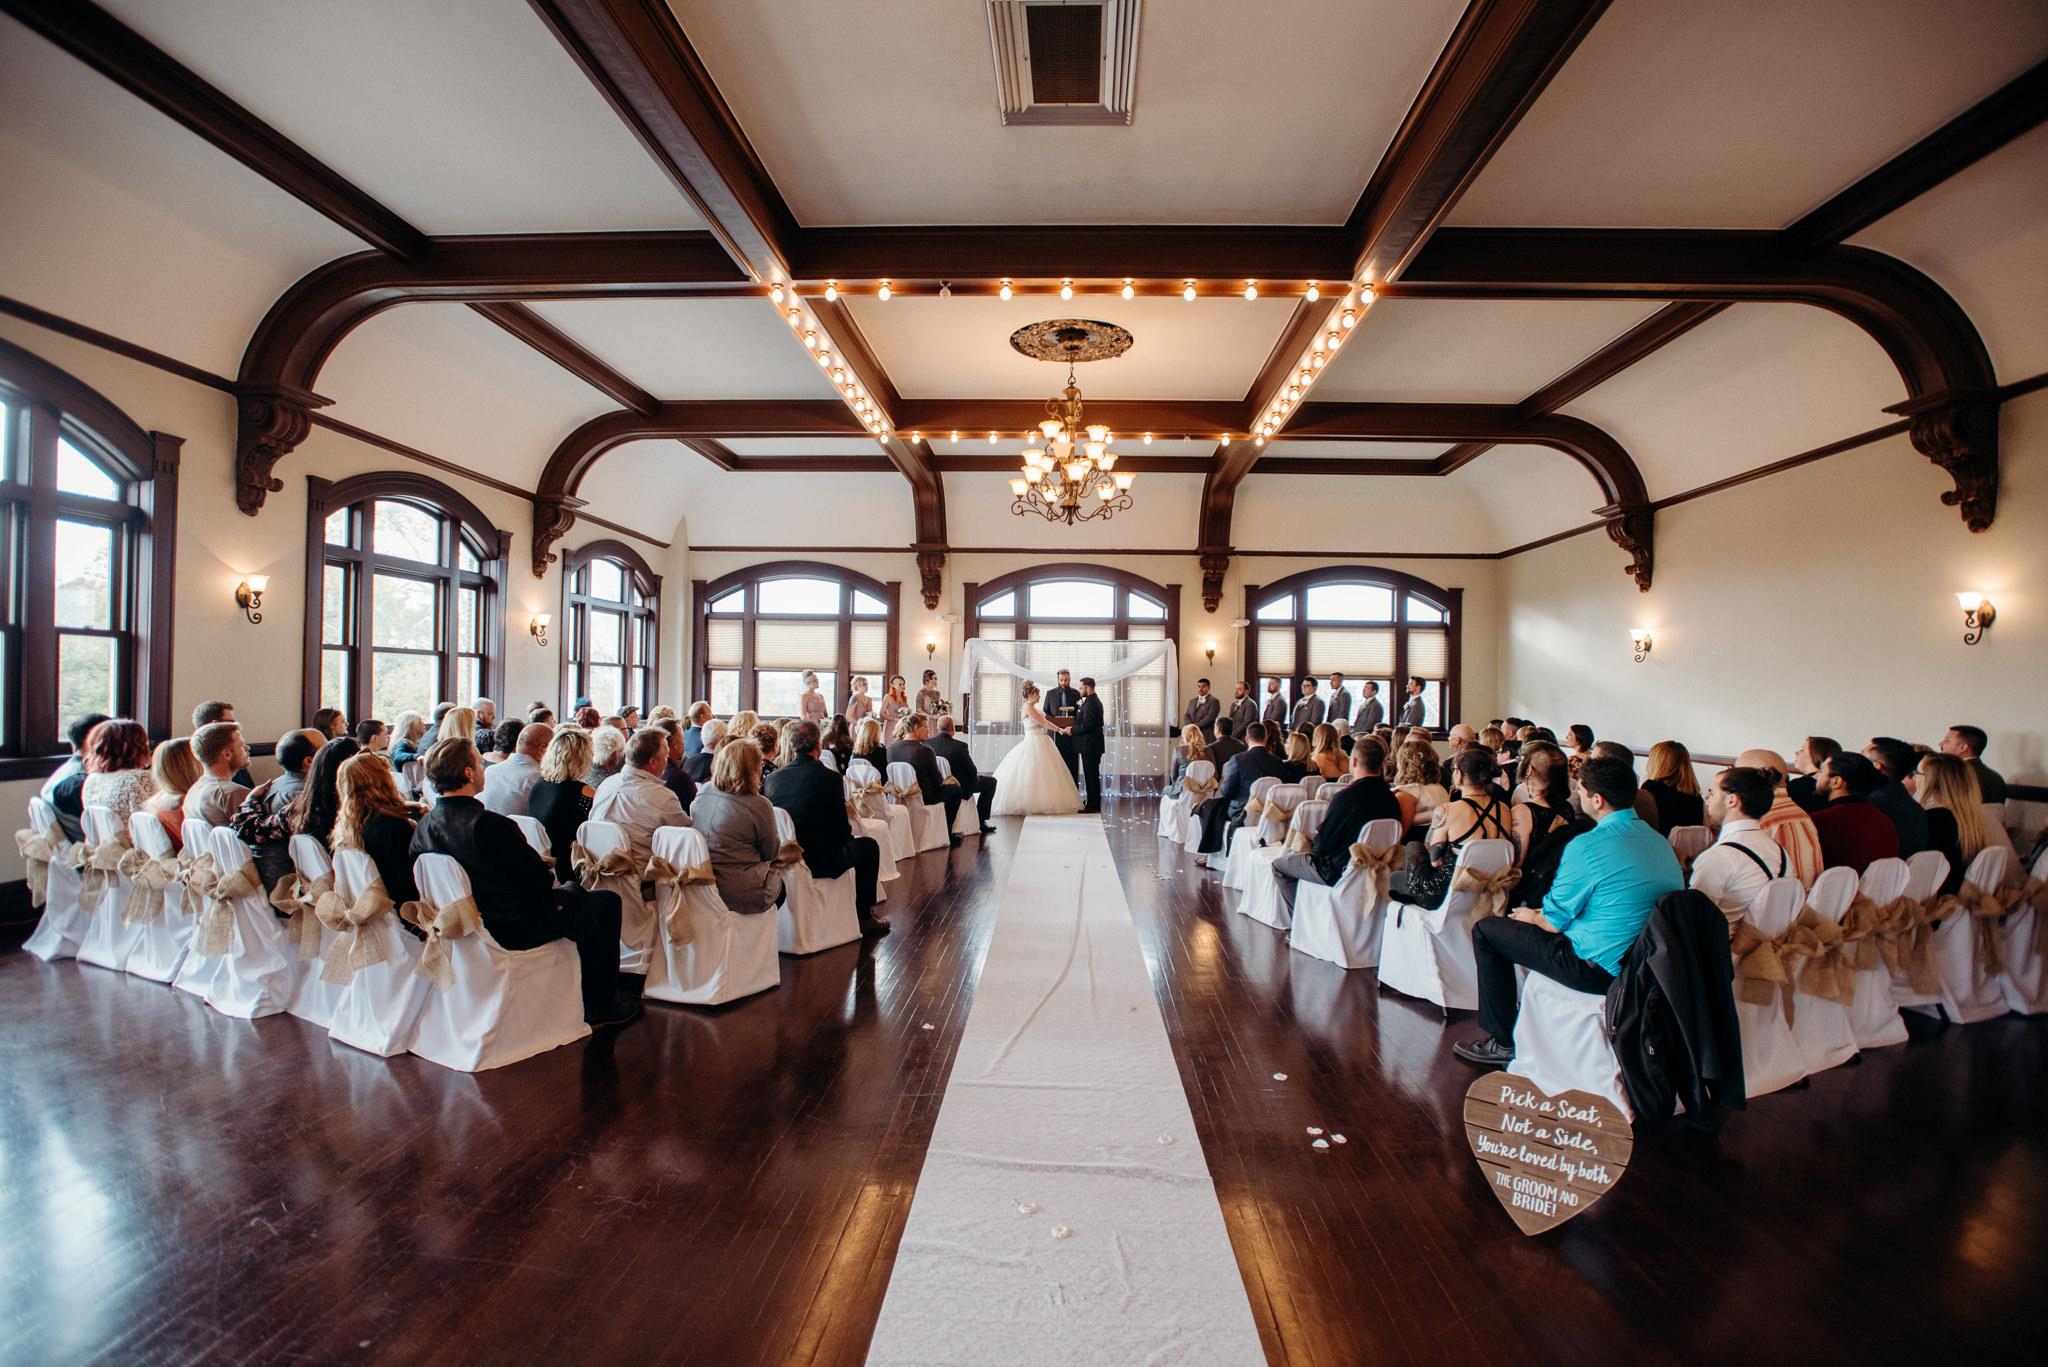 Grant Beachy Photo portrait wedding goshen elkhart south bend chicago-025.jpg